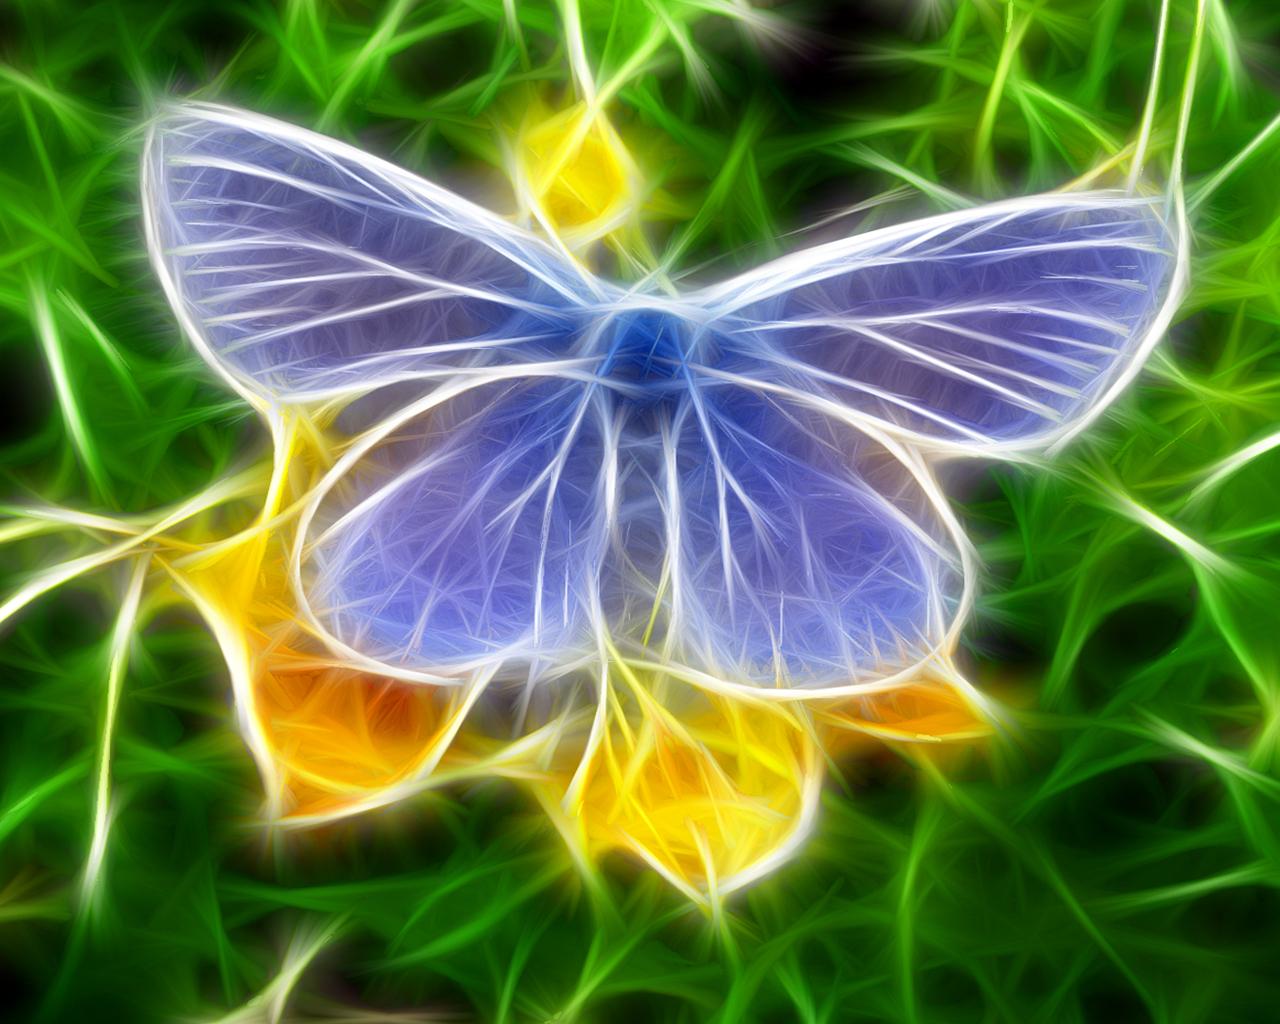 Wallpapers Background Butterfly Hd Wallpaper Butterfly 3d Wallpapers 1280x1024